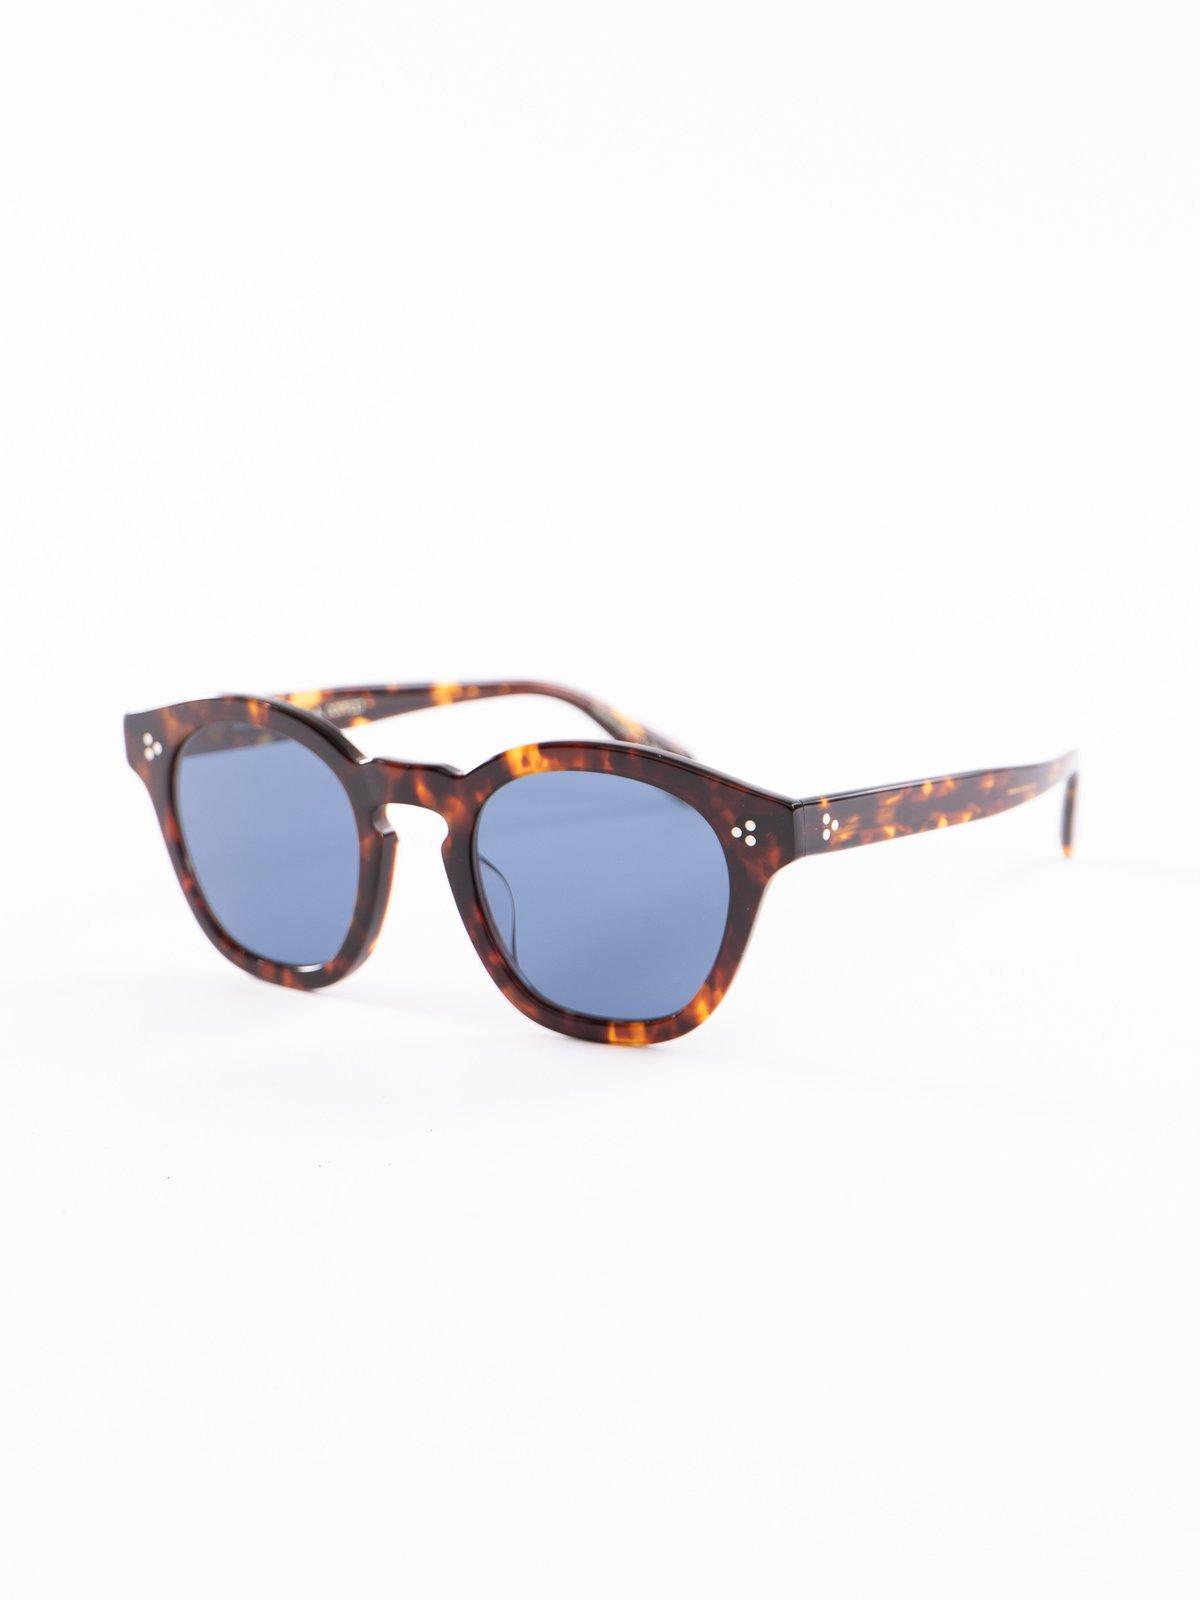 DM2/Dark Blue Boudreau LA Sunglasses - Image 2